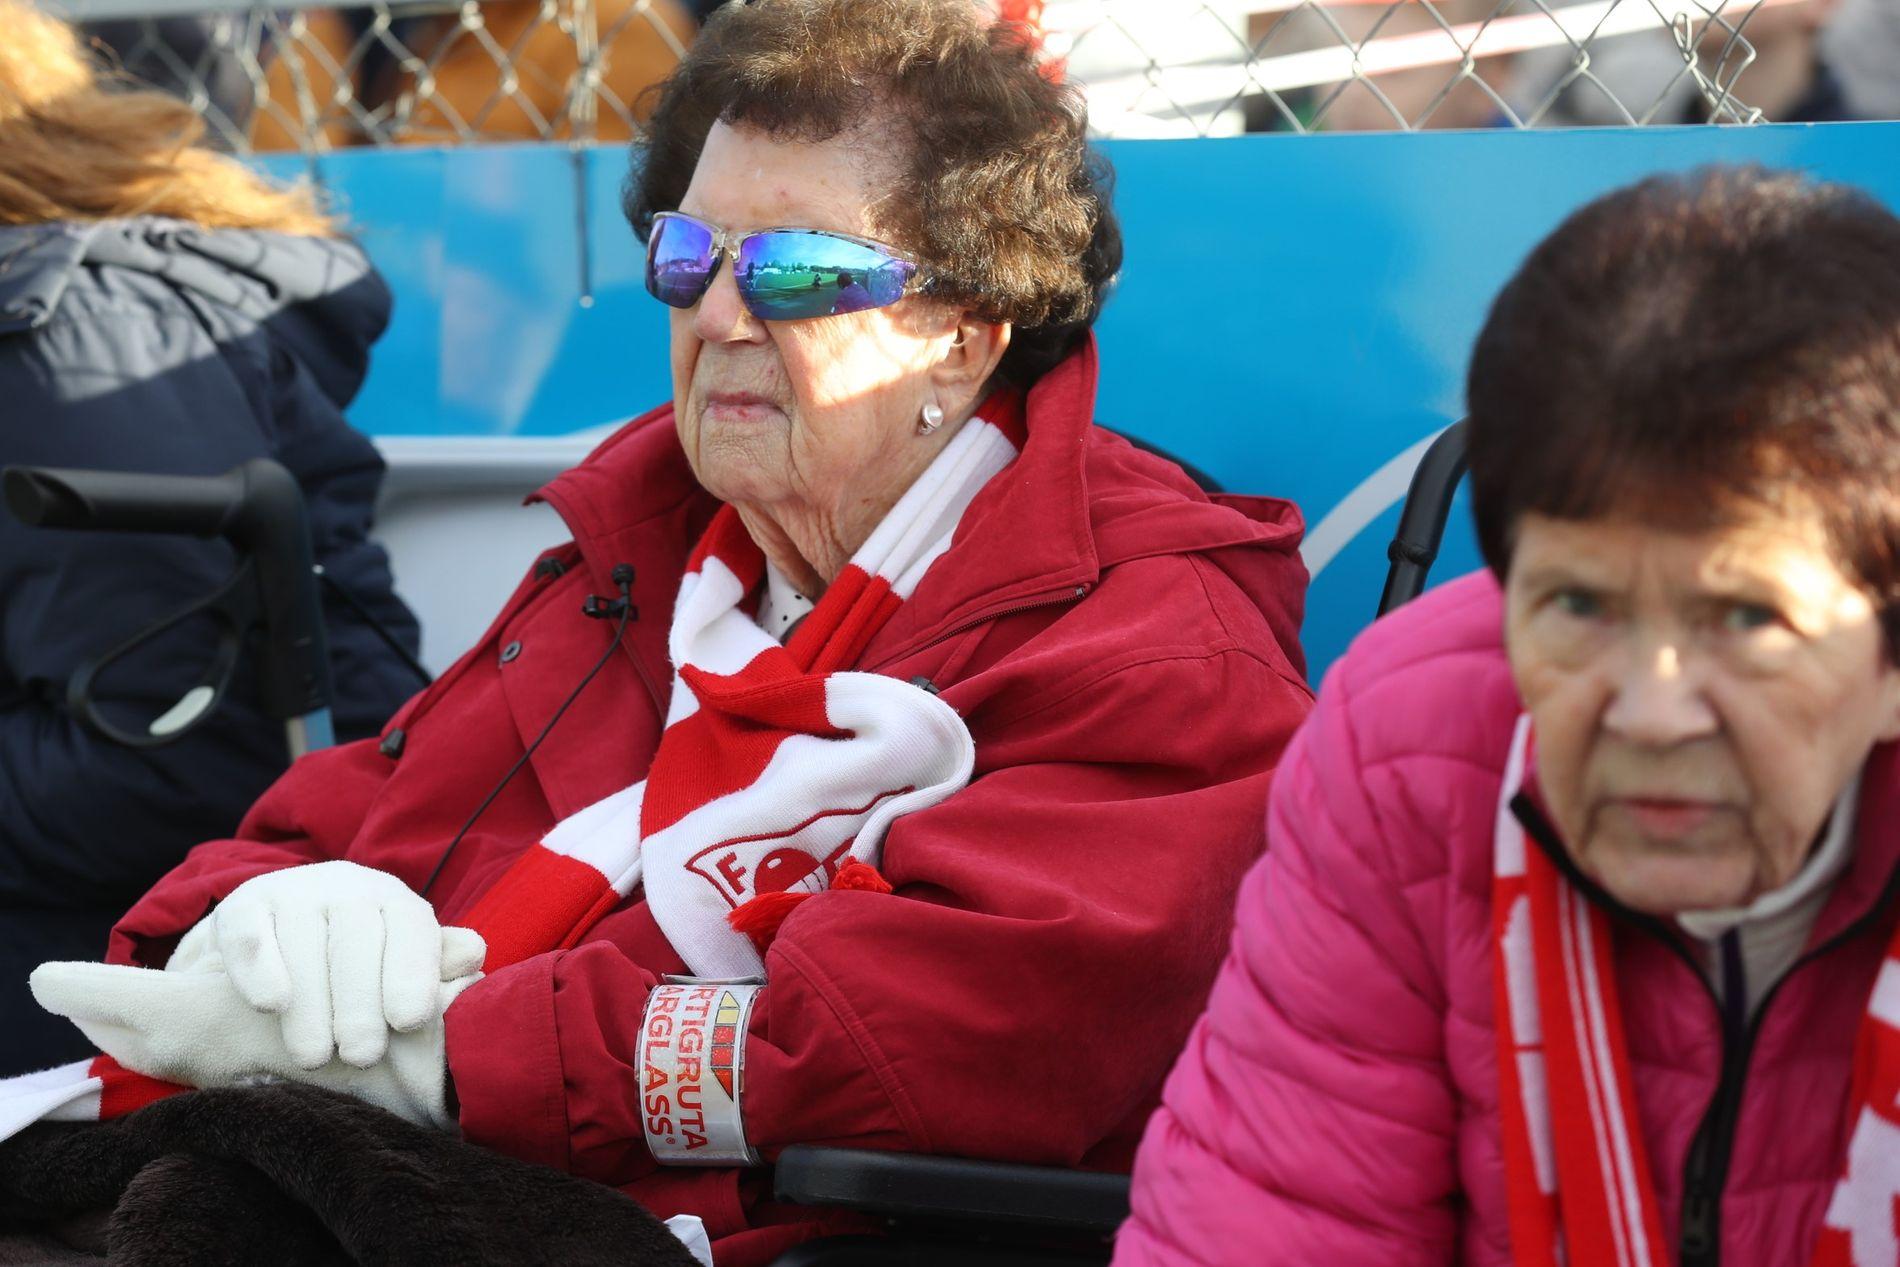 MOR OG DATTER: Miriam Isdal (101) og datteren Mai (68) følger spent og nøye med under kampen mellom favorittklubben Fredrikstad og Grorud på Grorud stadion lørdag.